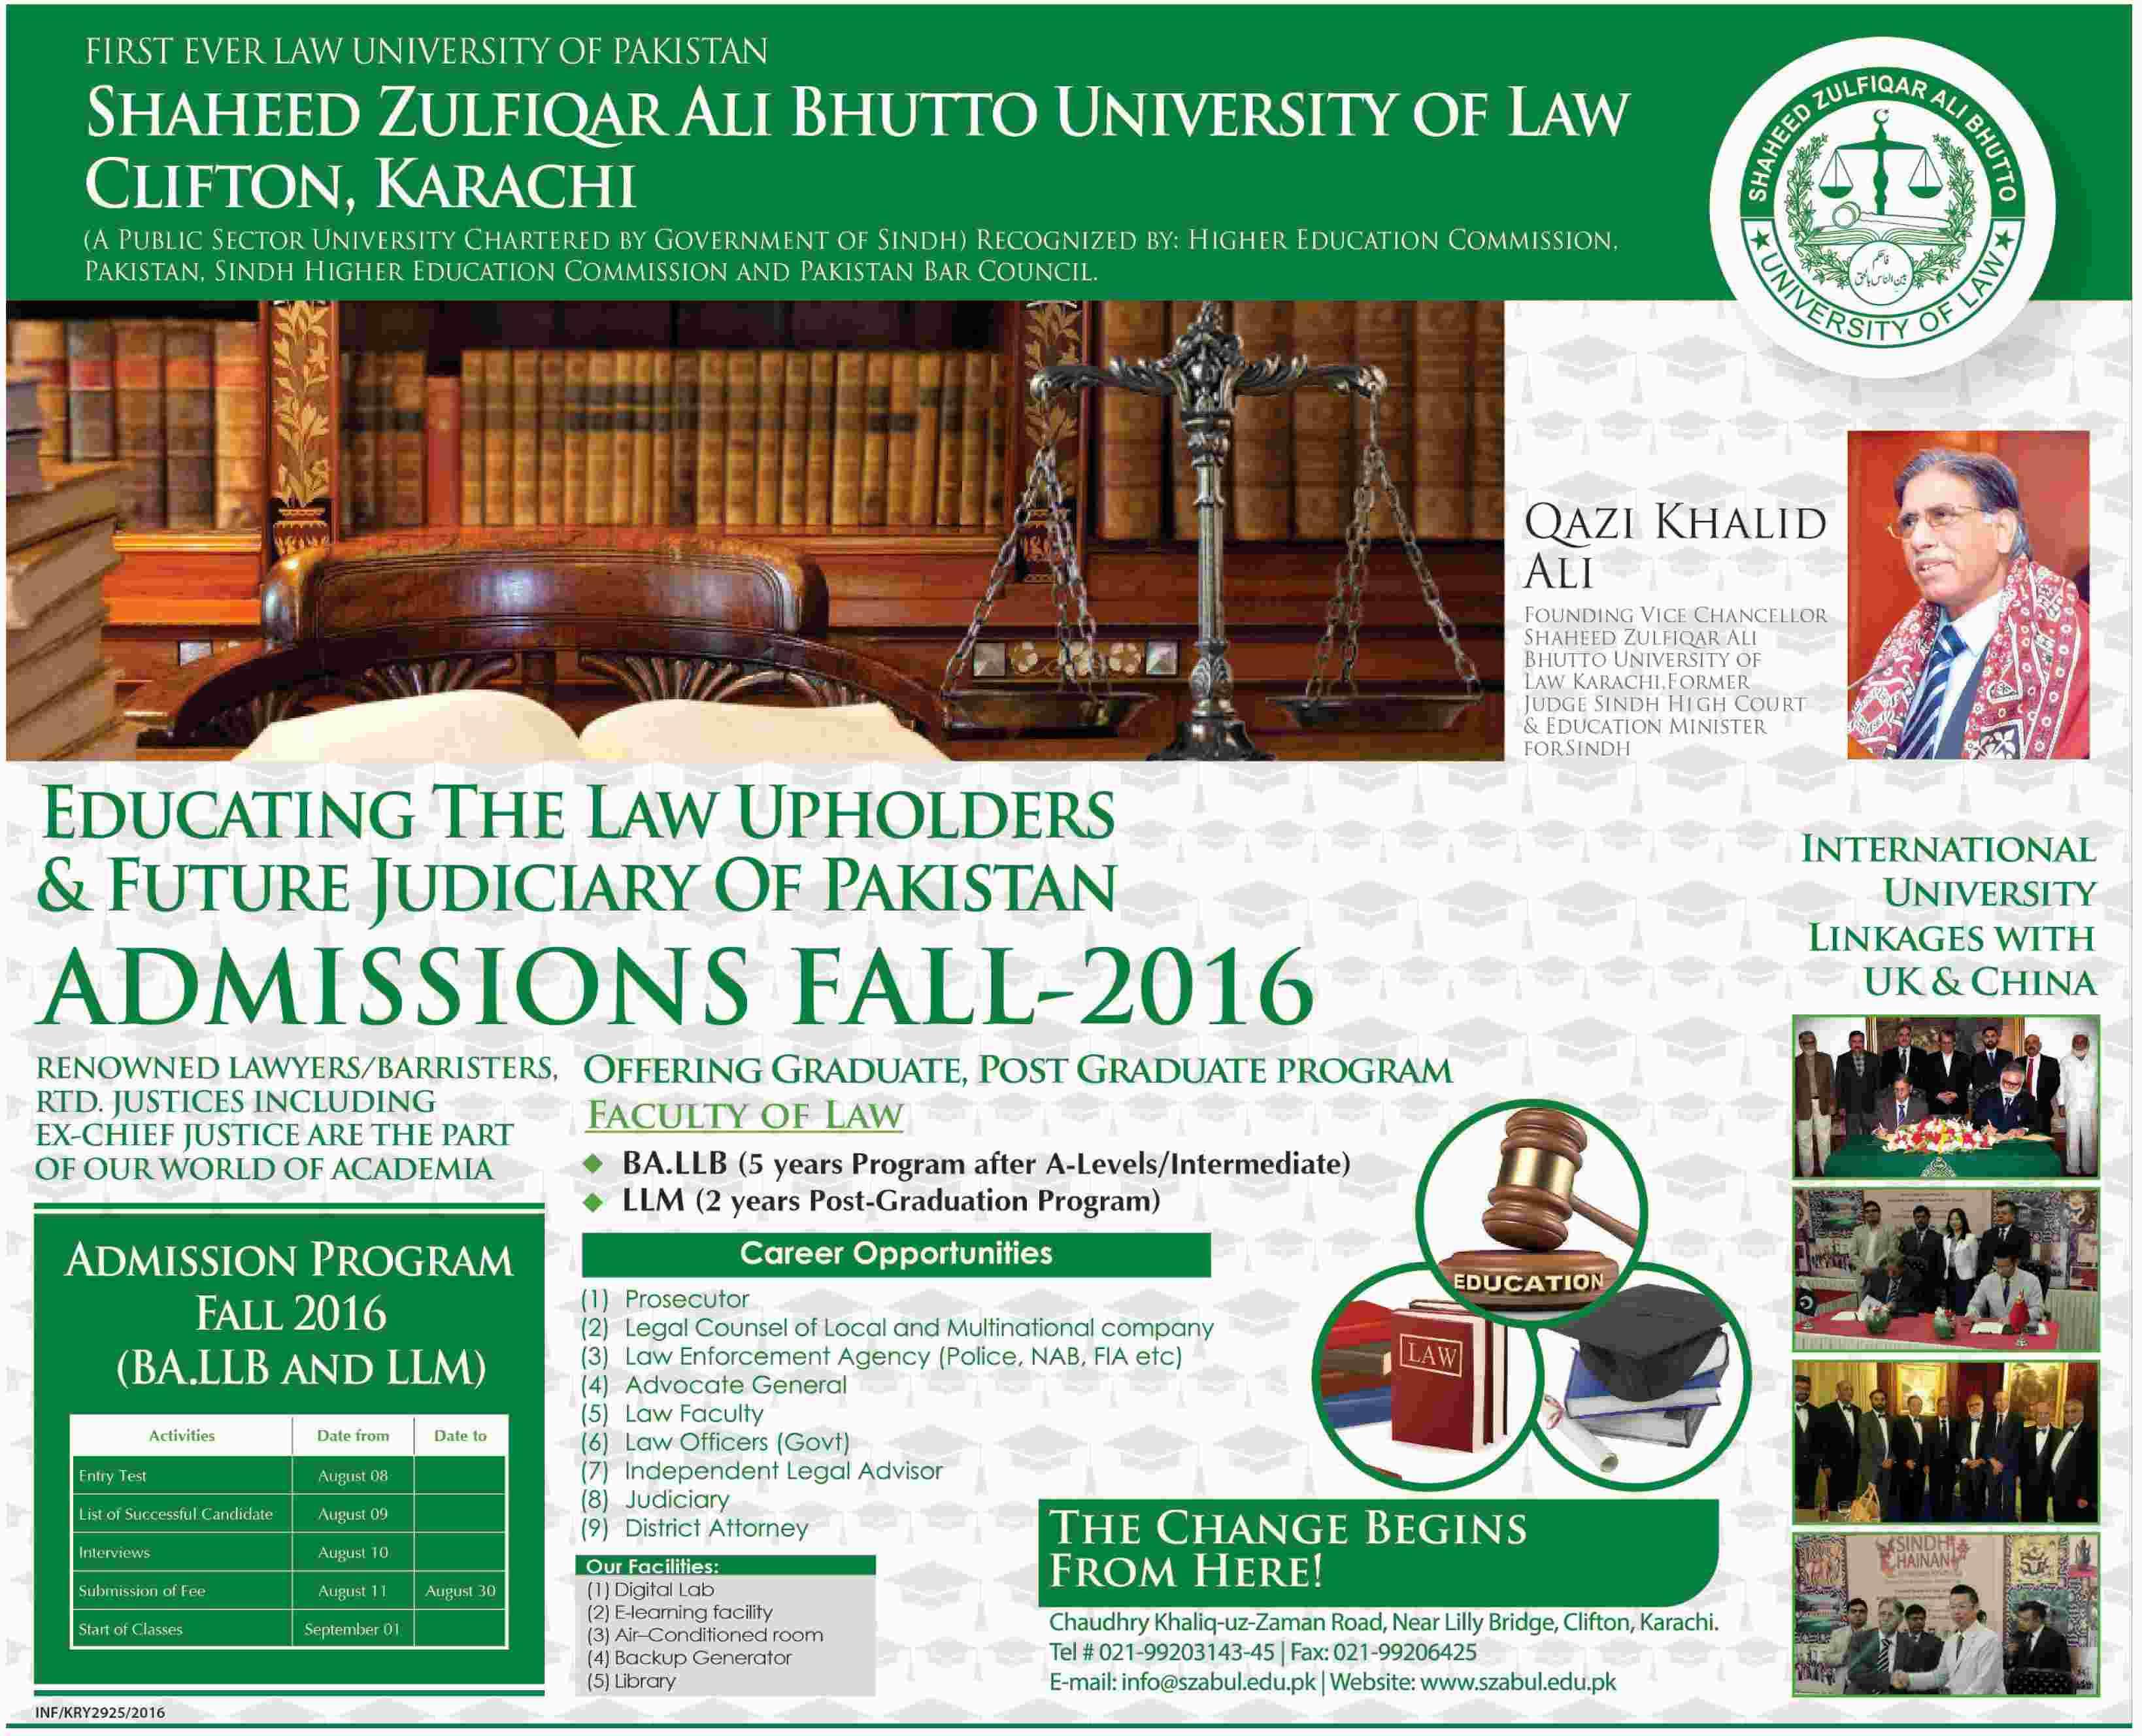 Shaheed Zulfikar Ali Bhutto University of Law Clifton Karachi Admissions